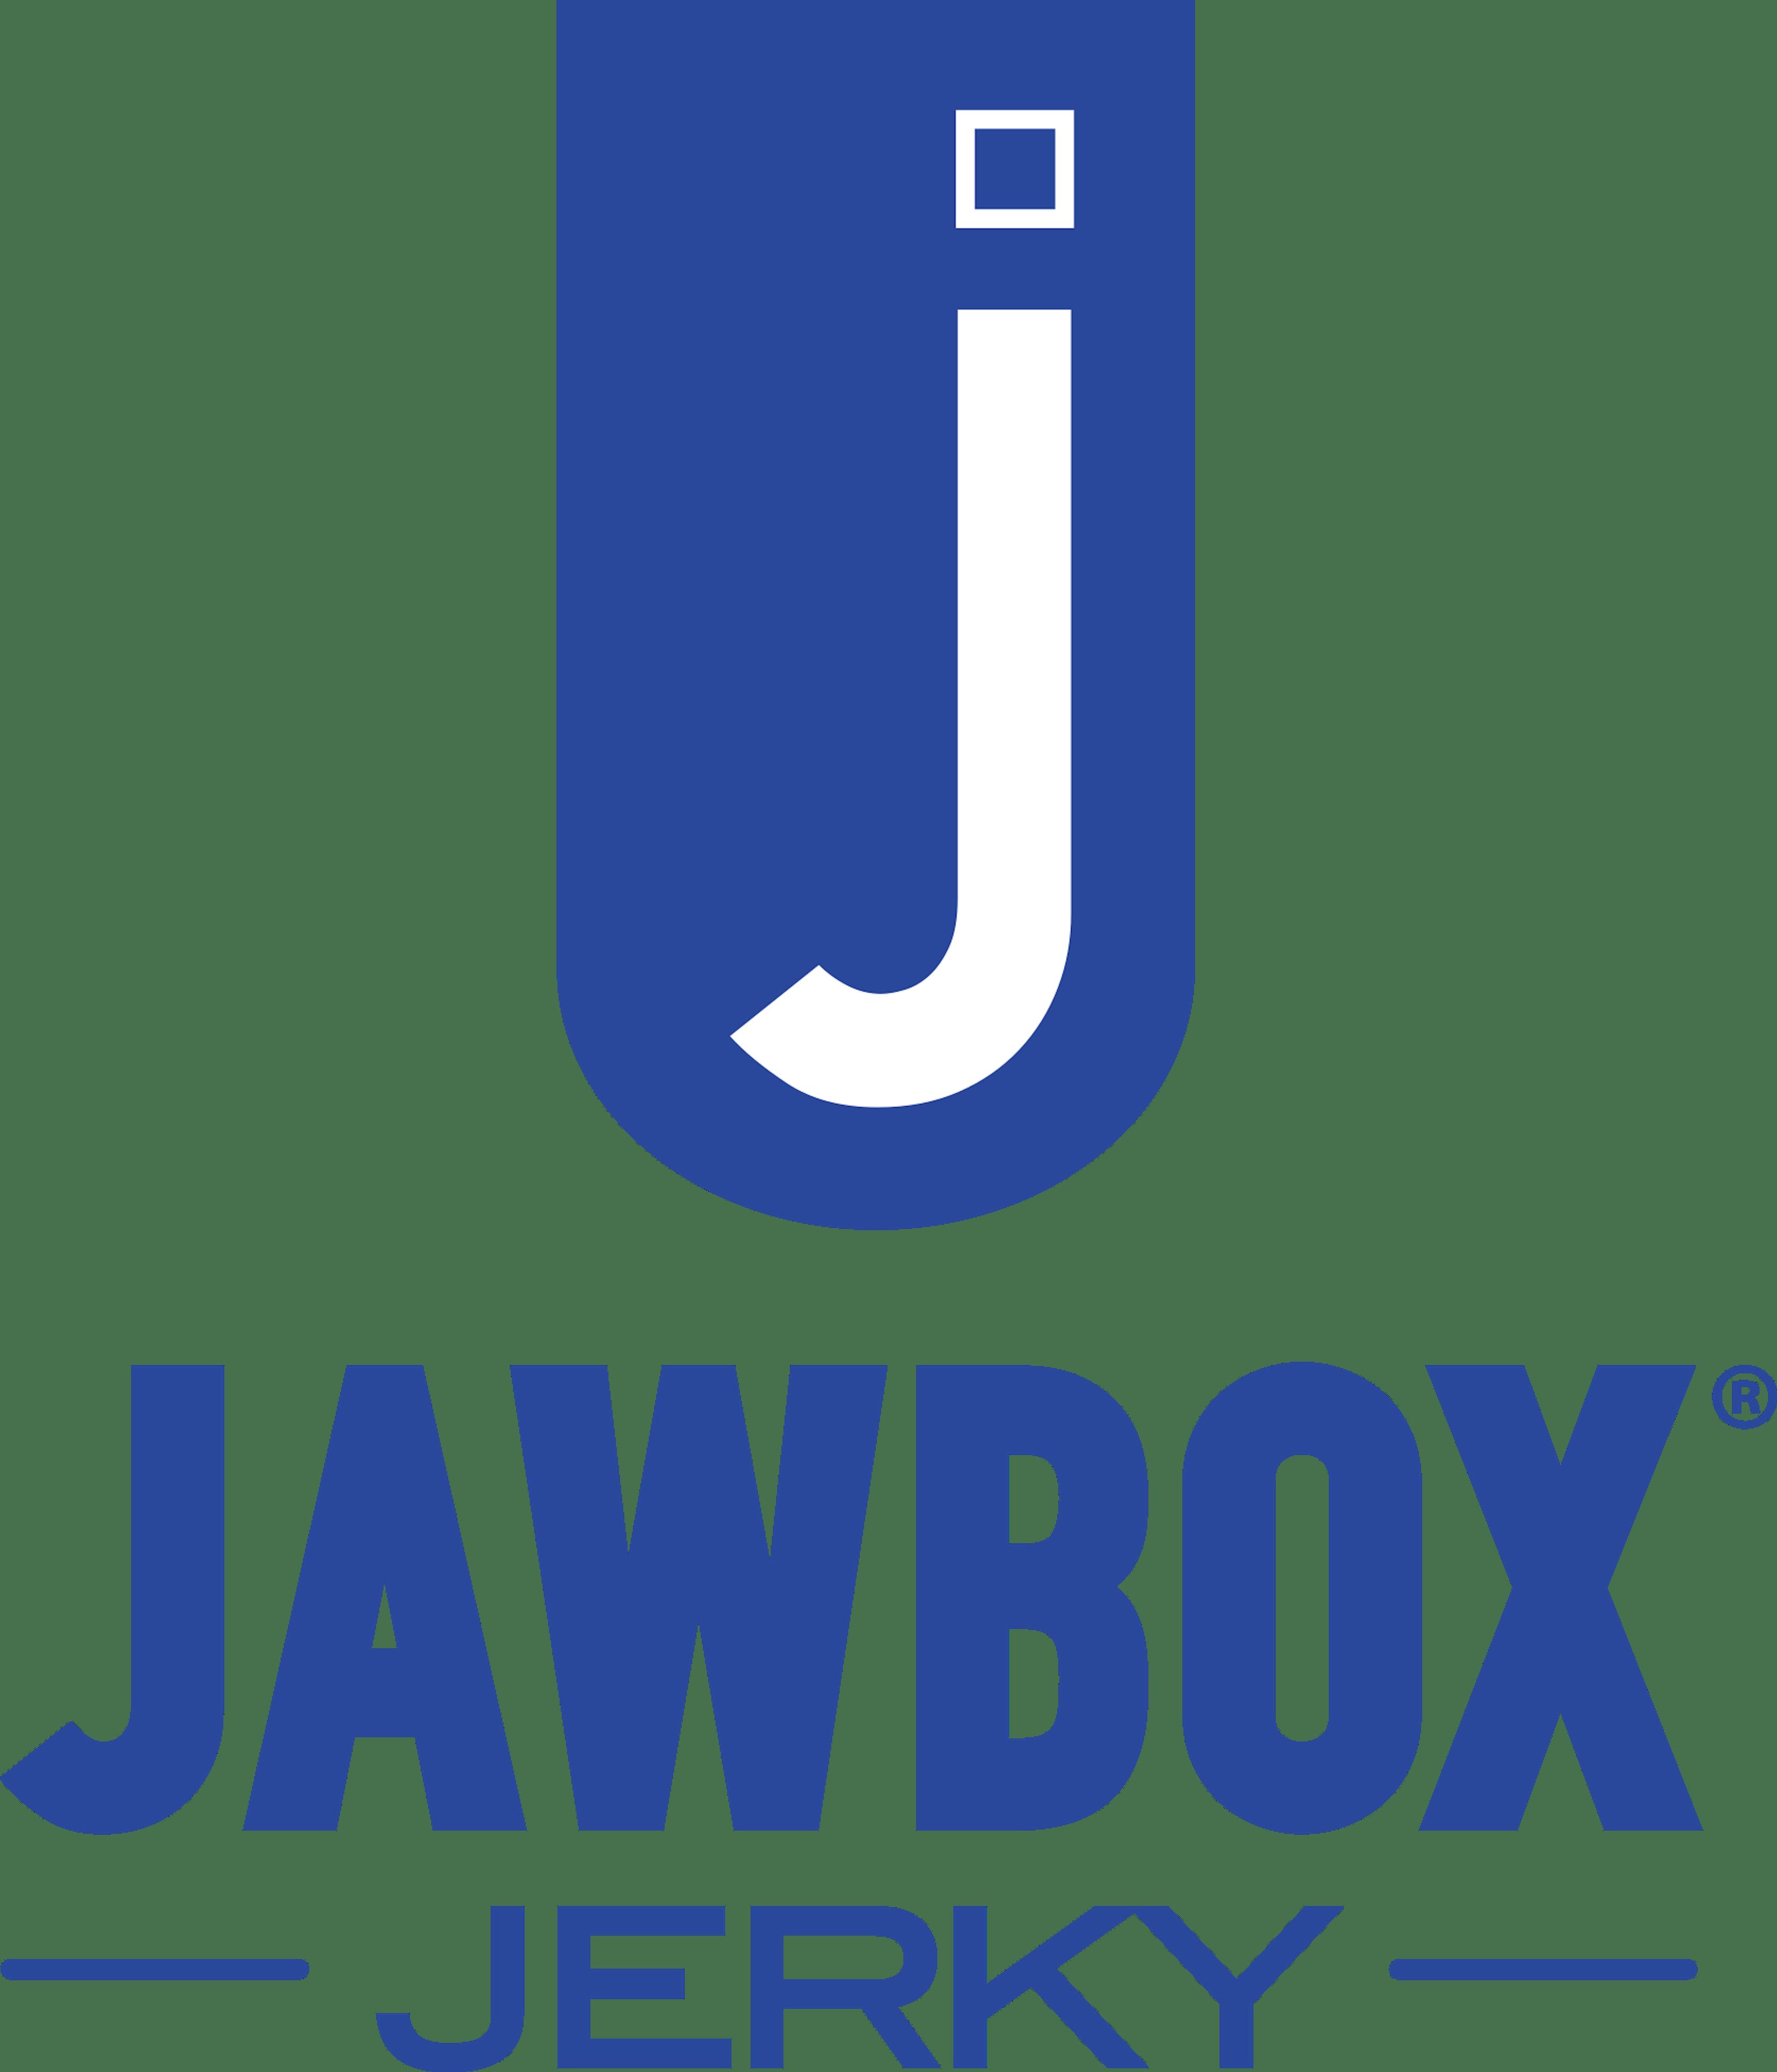 Jawbox Jerky